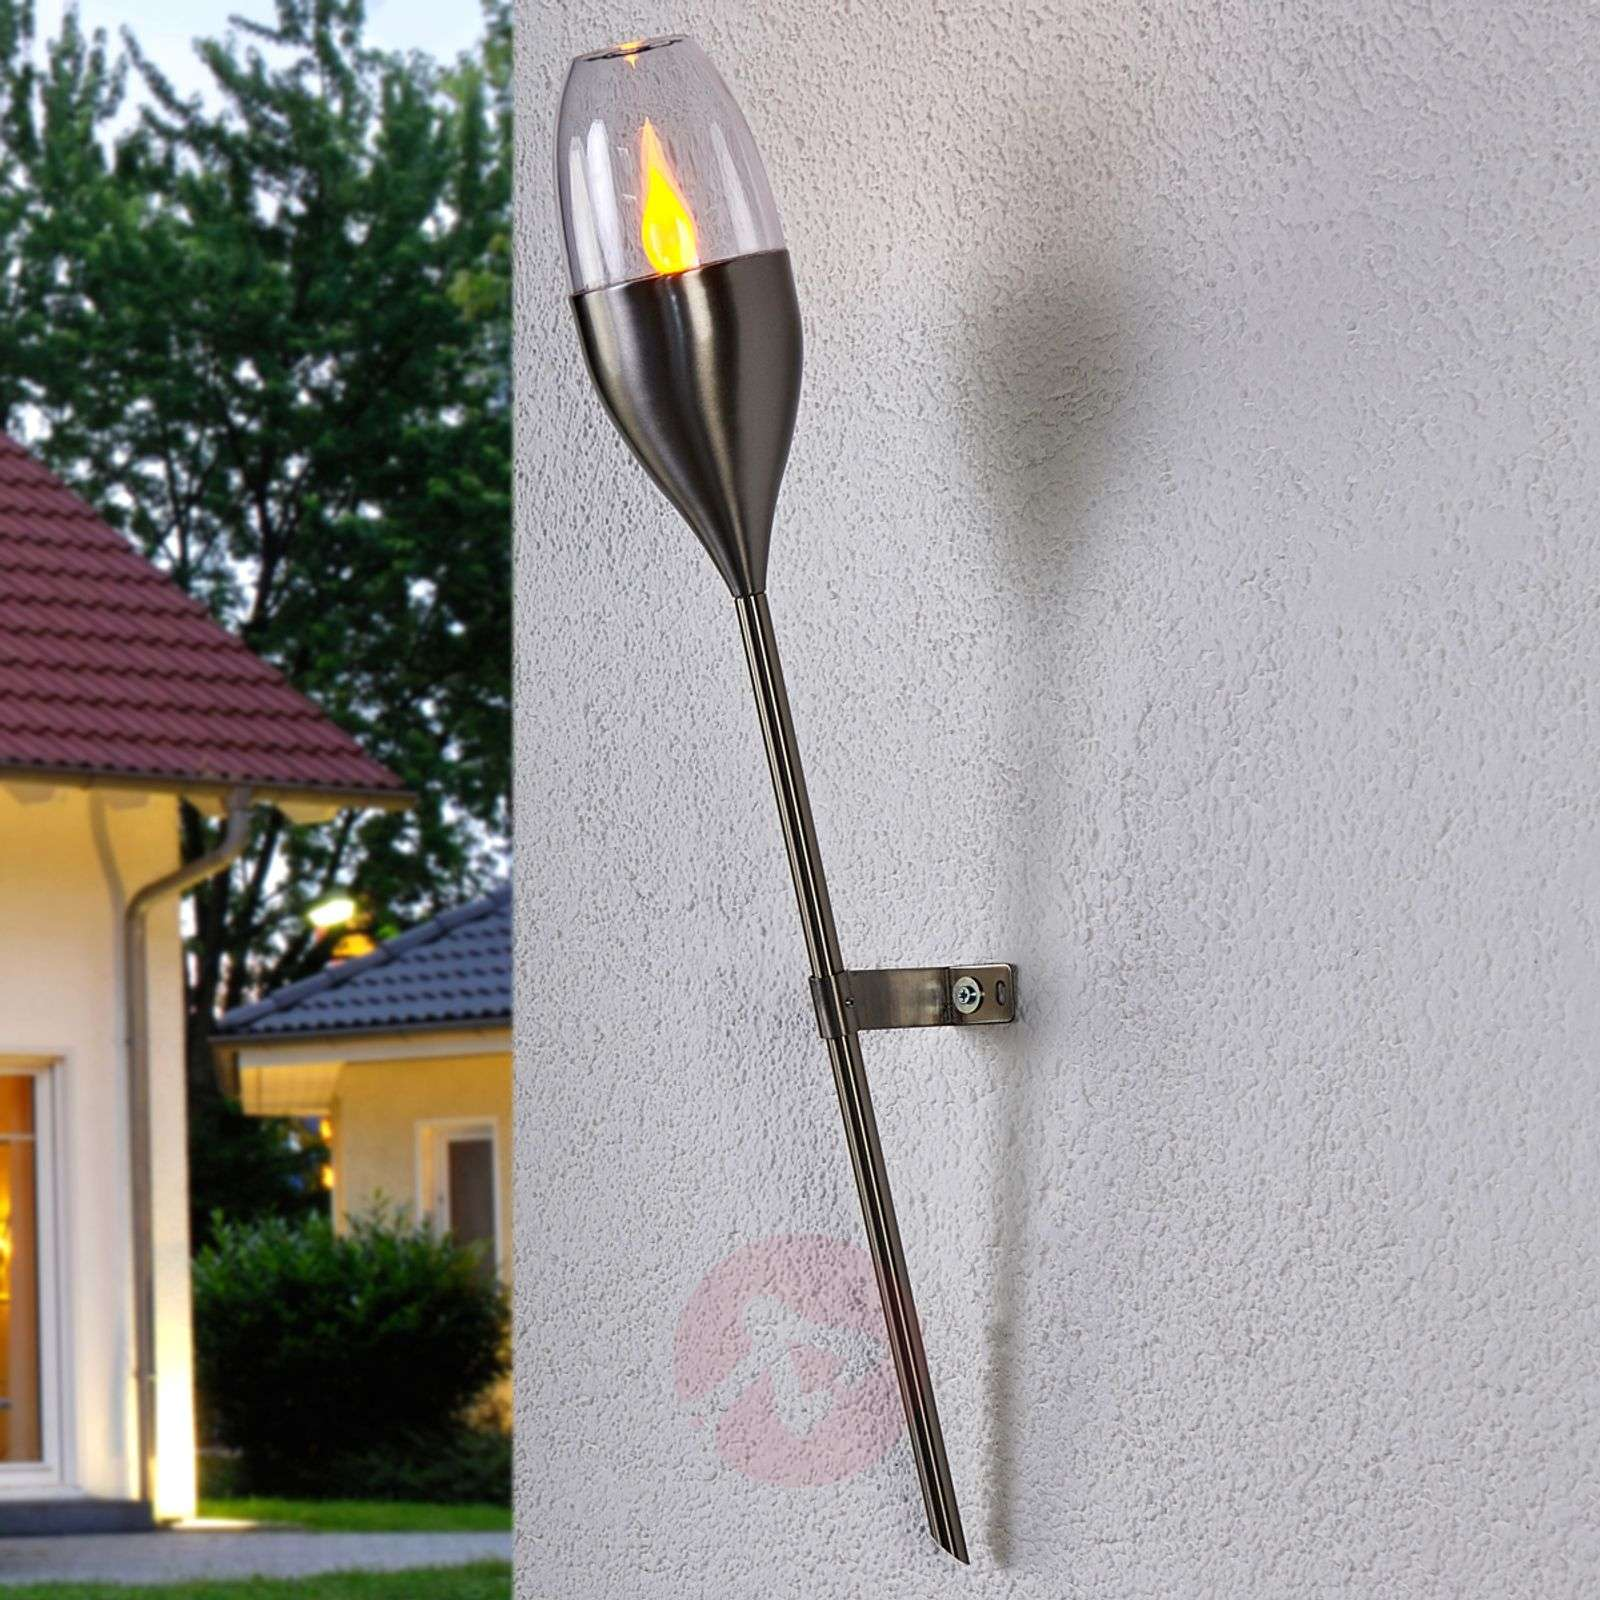 Solar wall light Jari with flickering LED-9945181-02